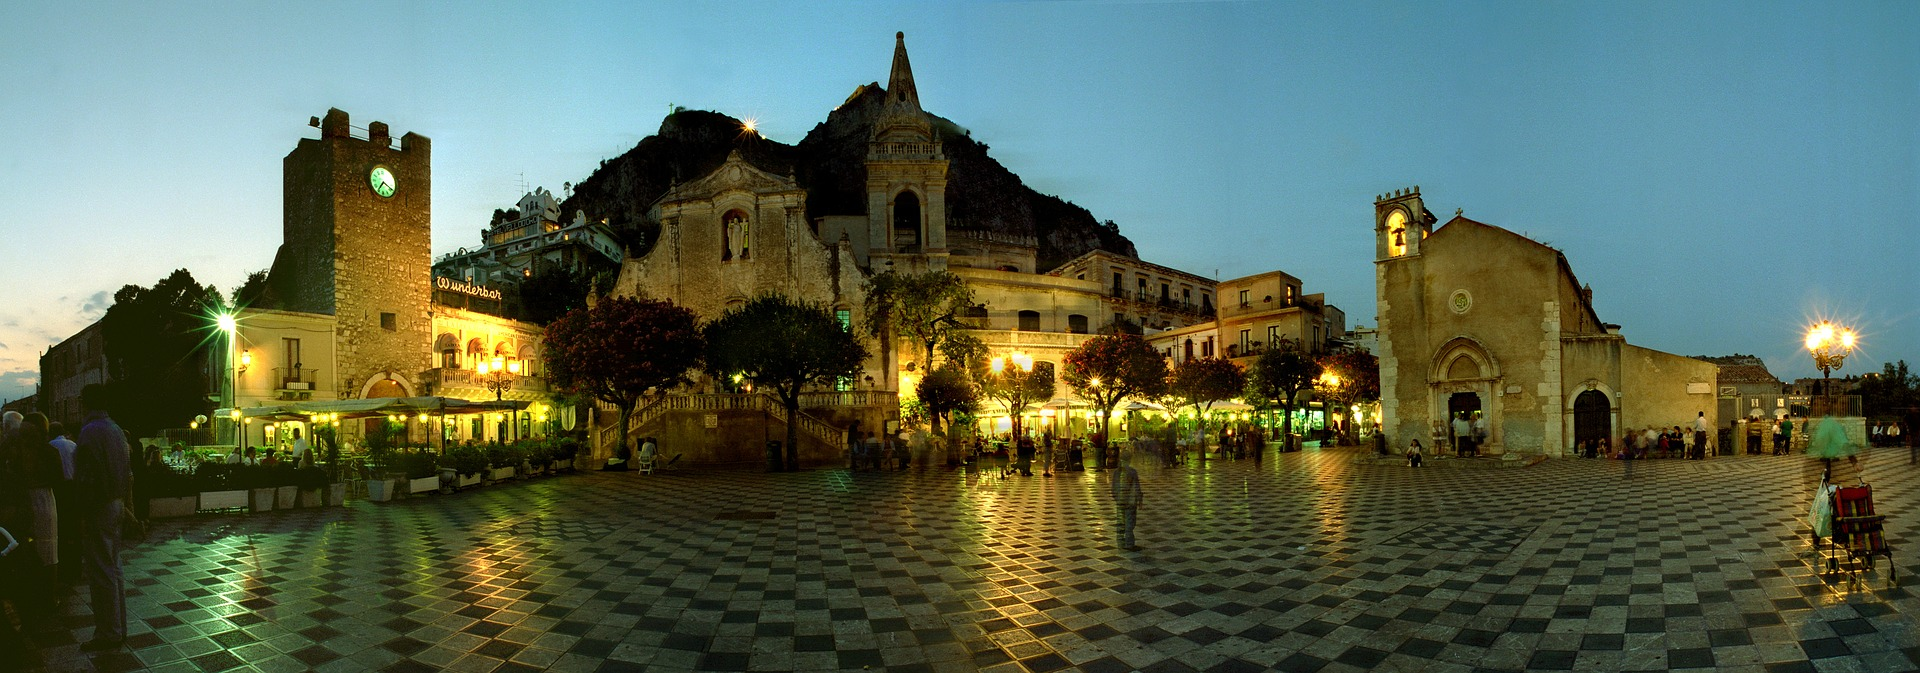 Estate in Sicilia